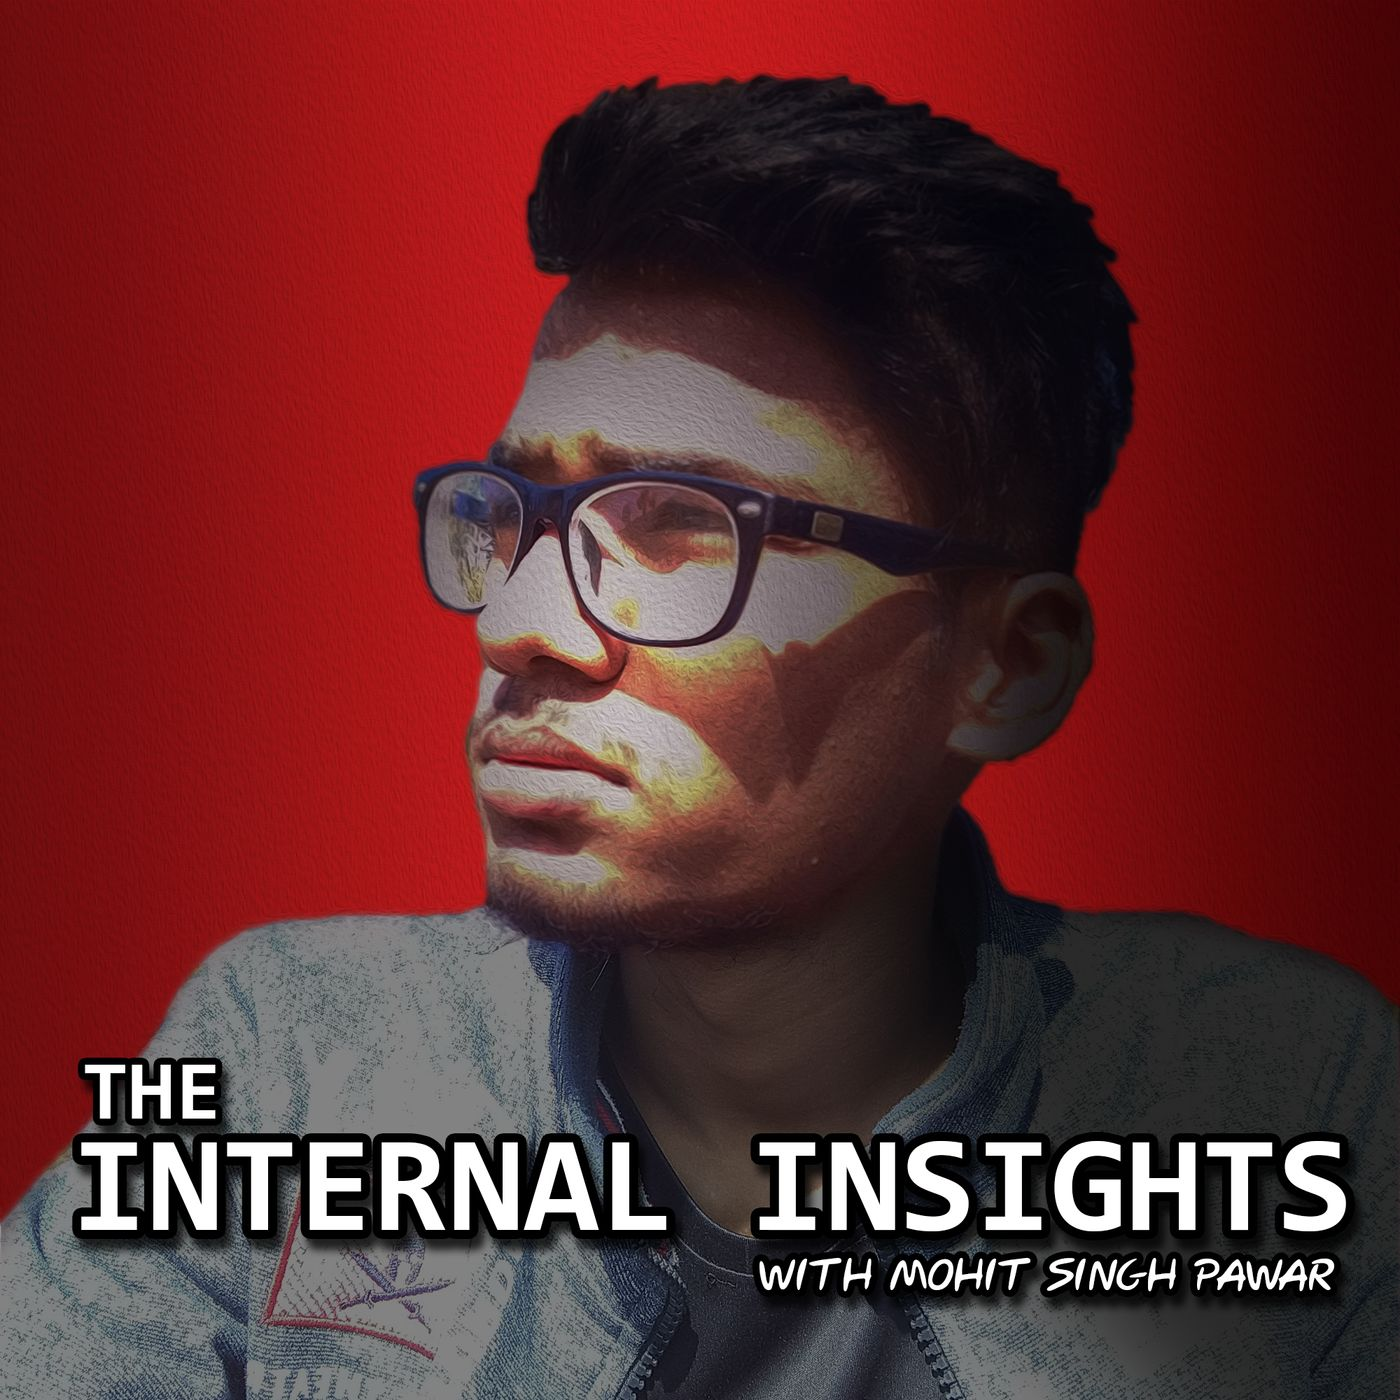 The Internal Insights